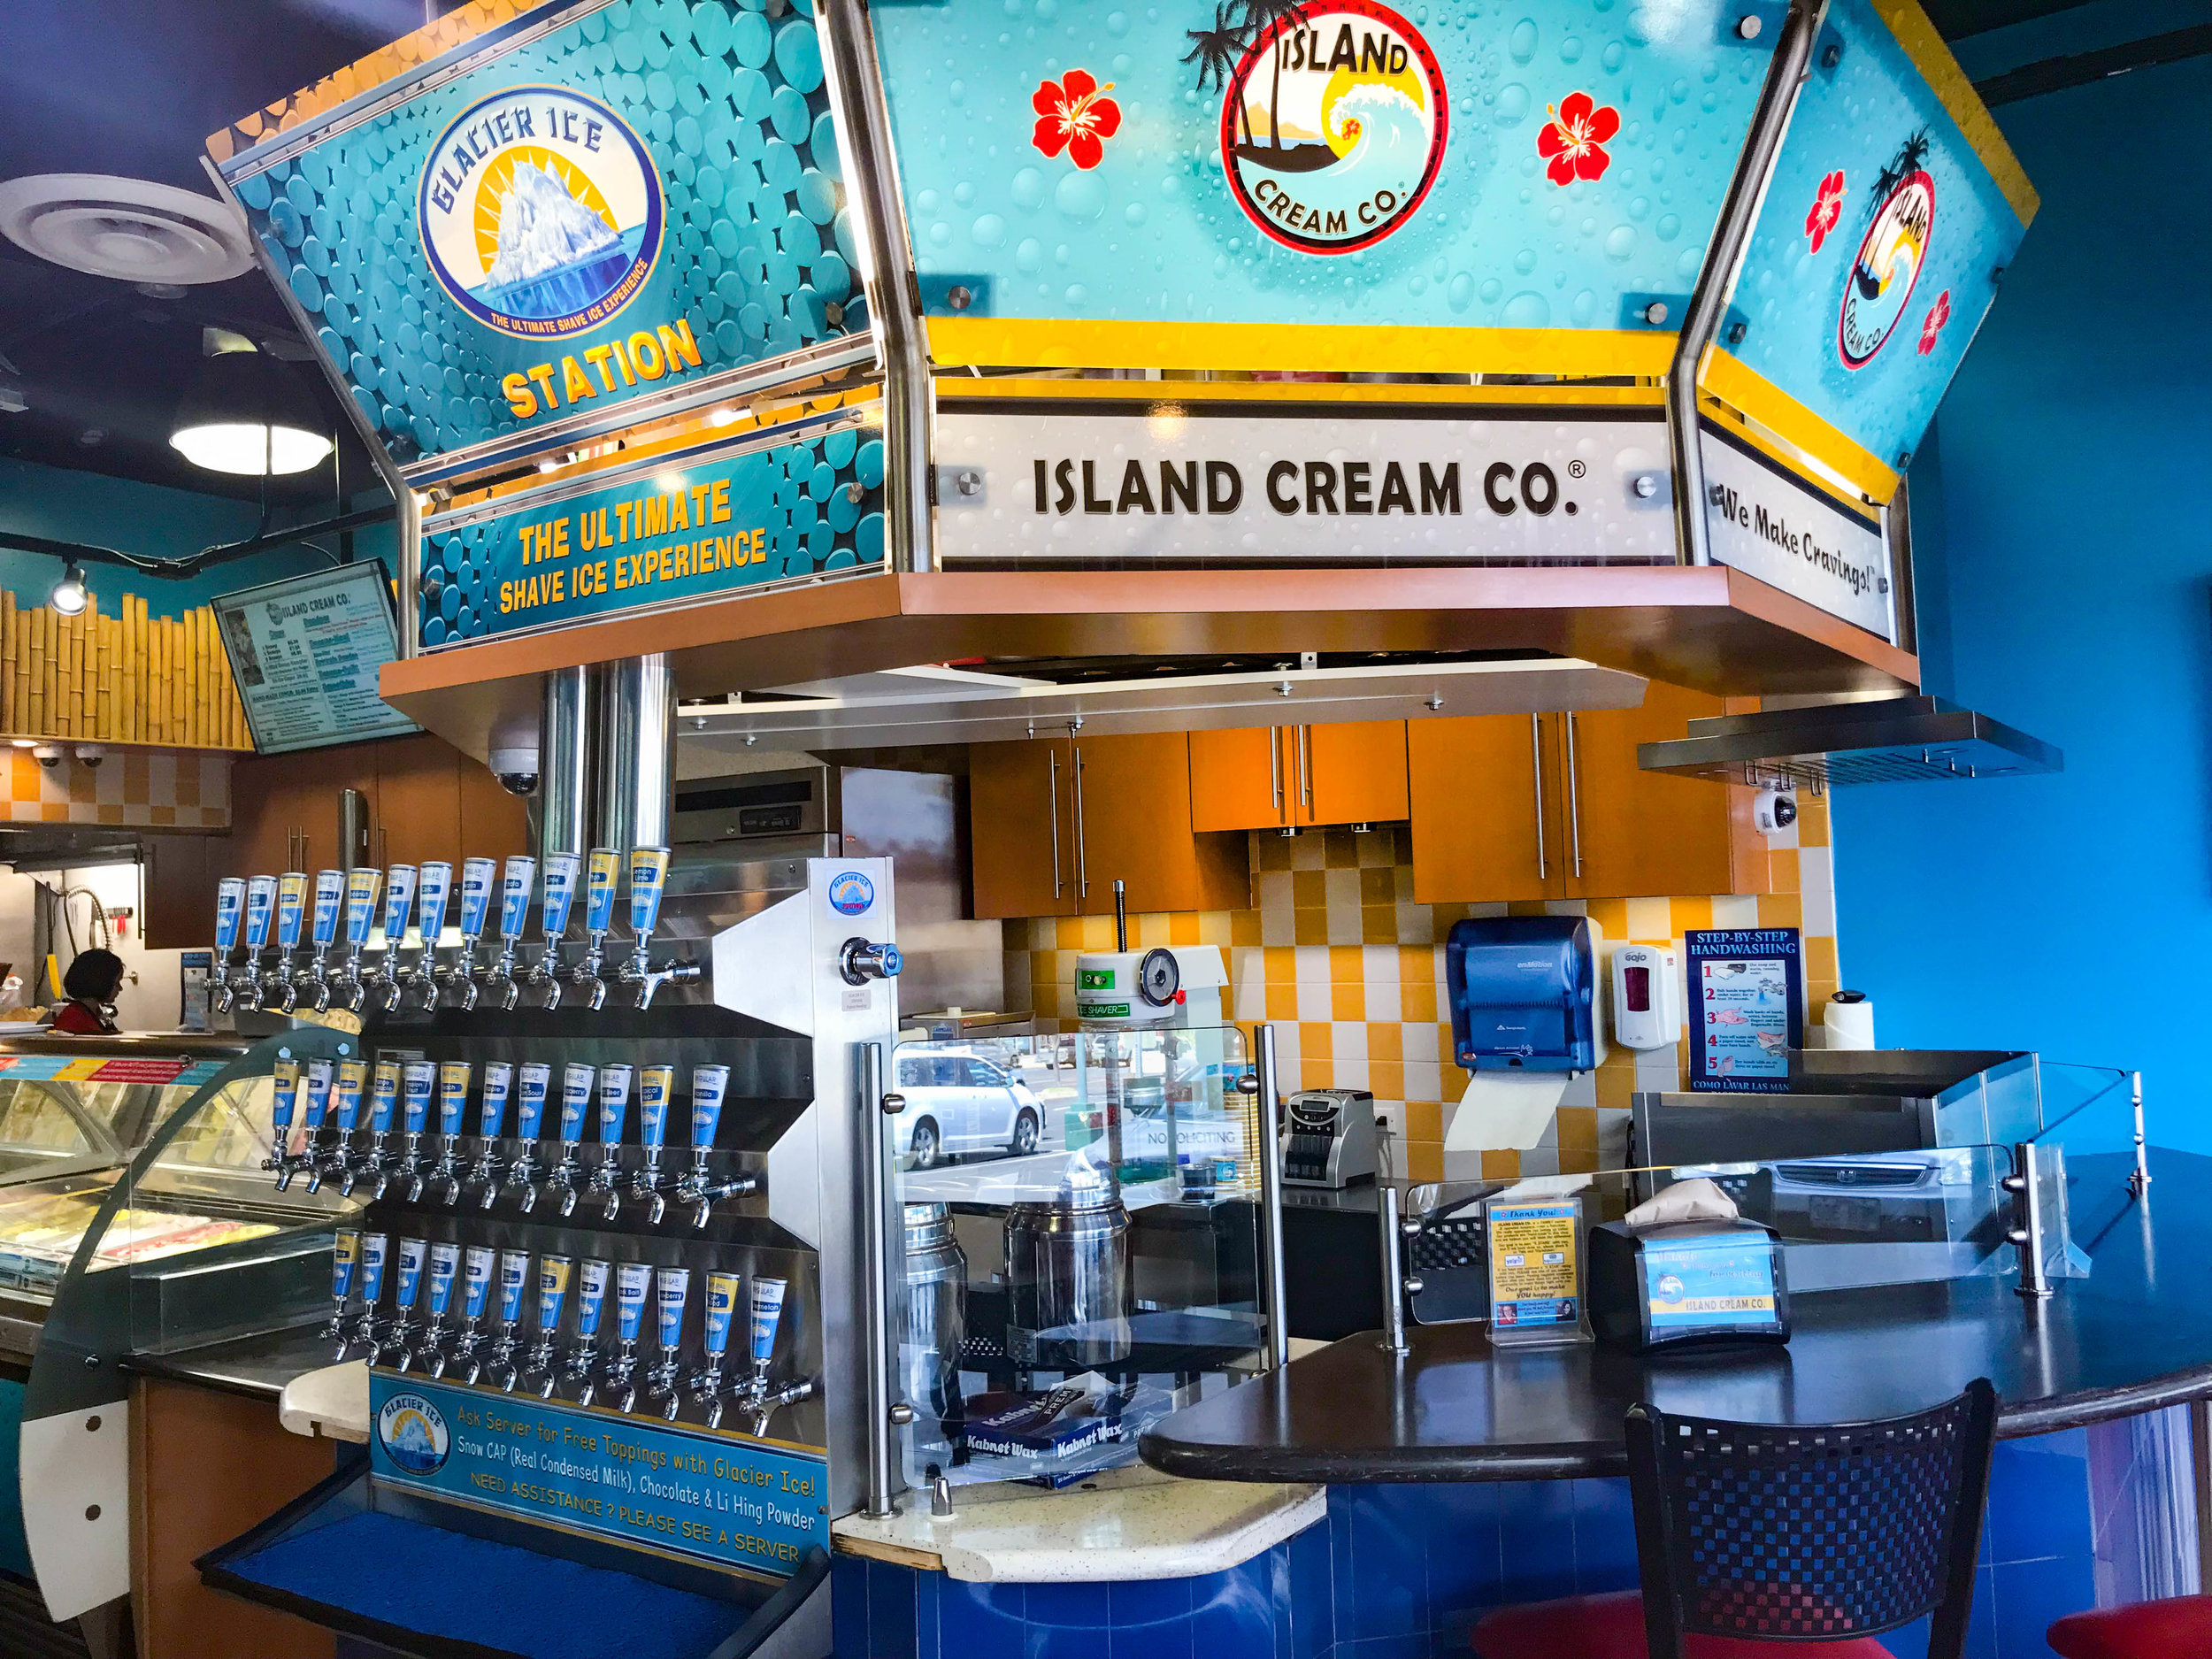 Maui_island_cream_co.jpg